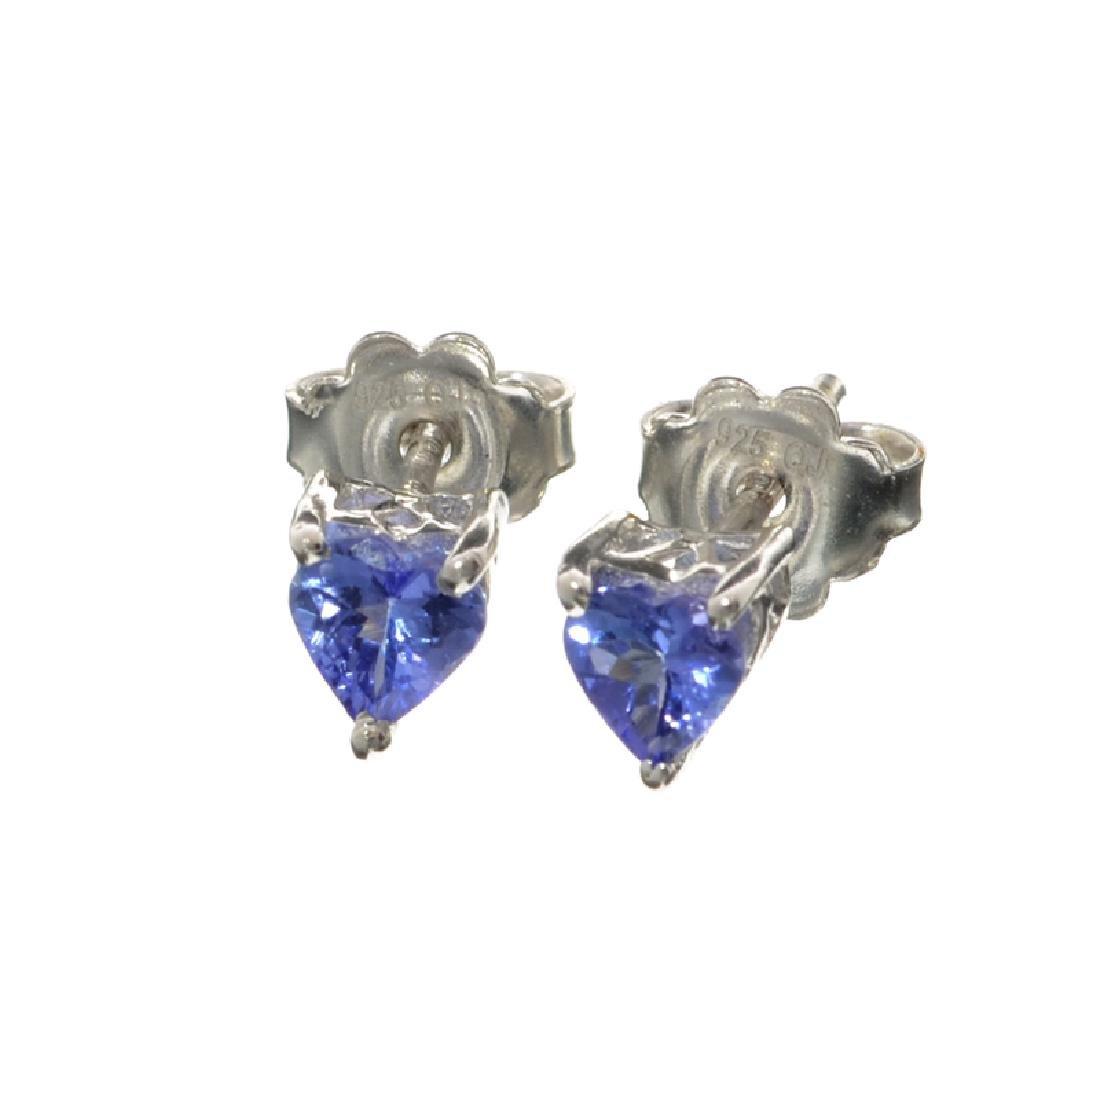 APP: 1k Fine Jewelry 1.20CT Heart Cut Tanzanite And